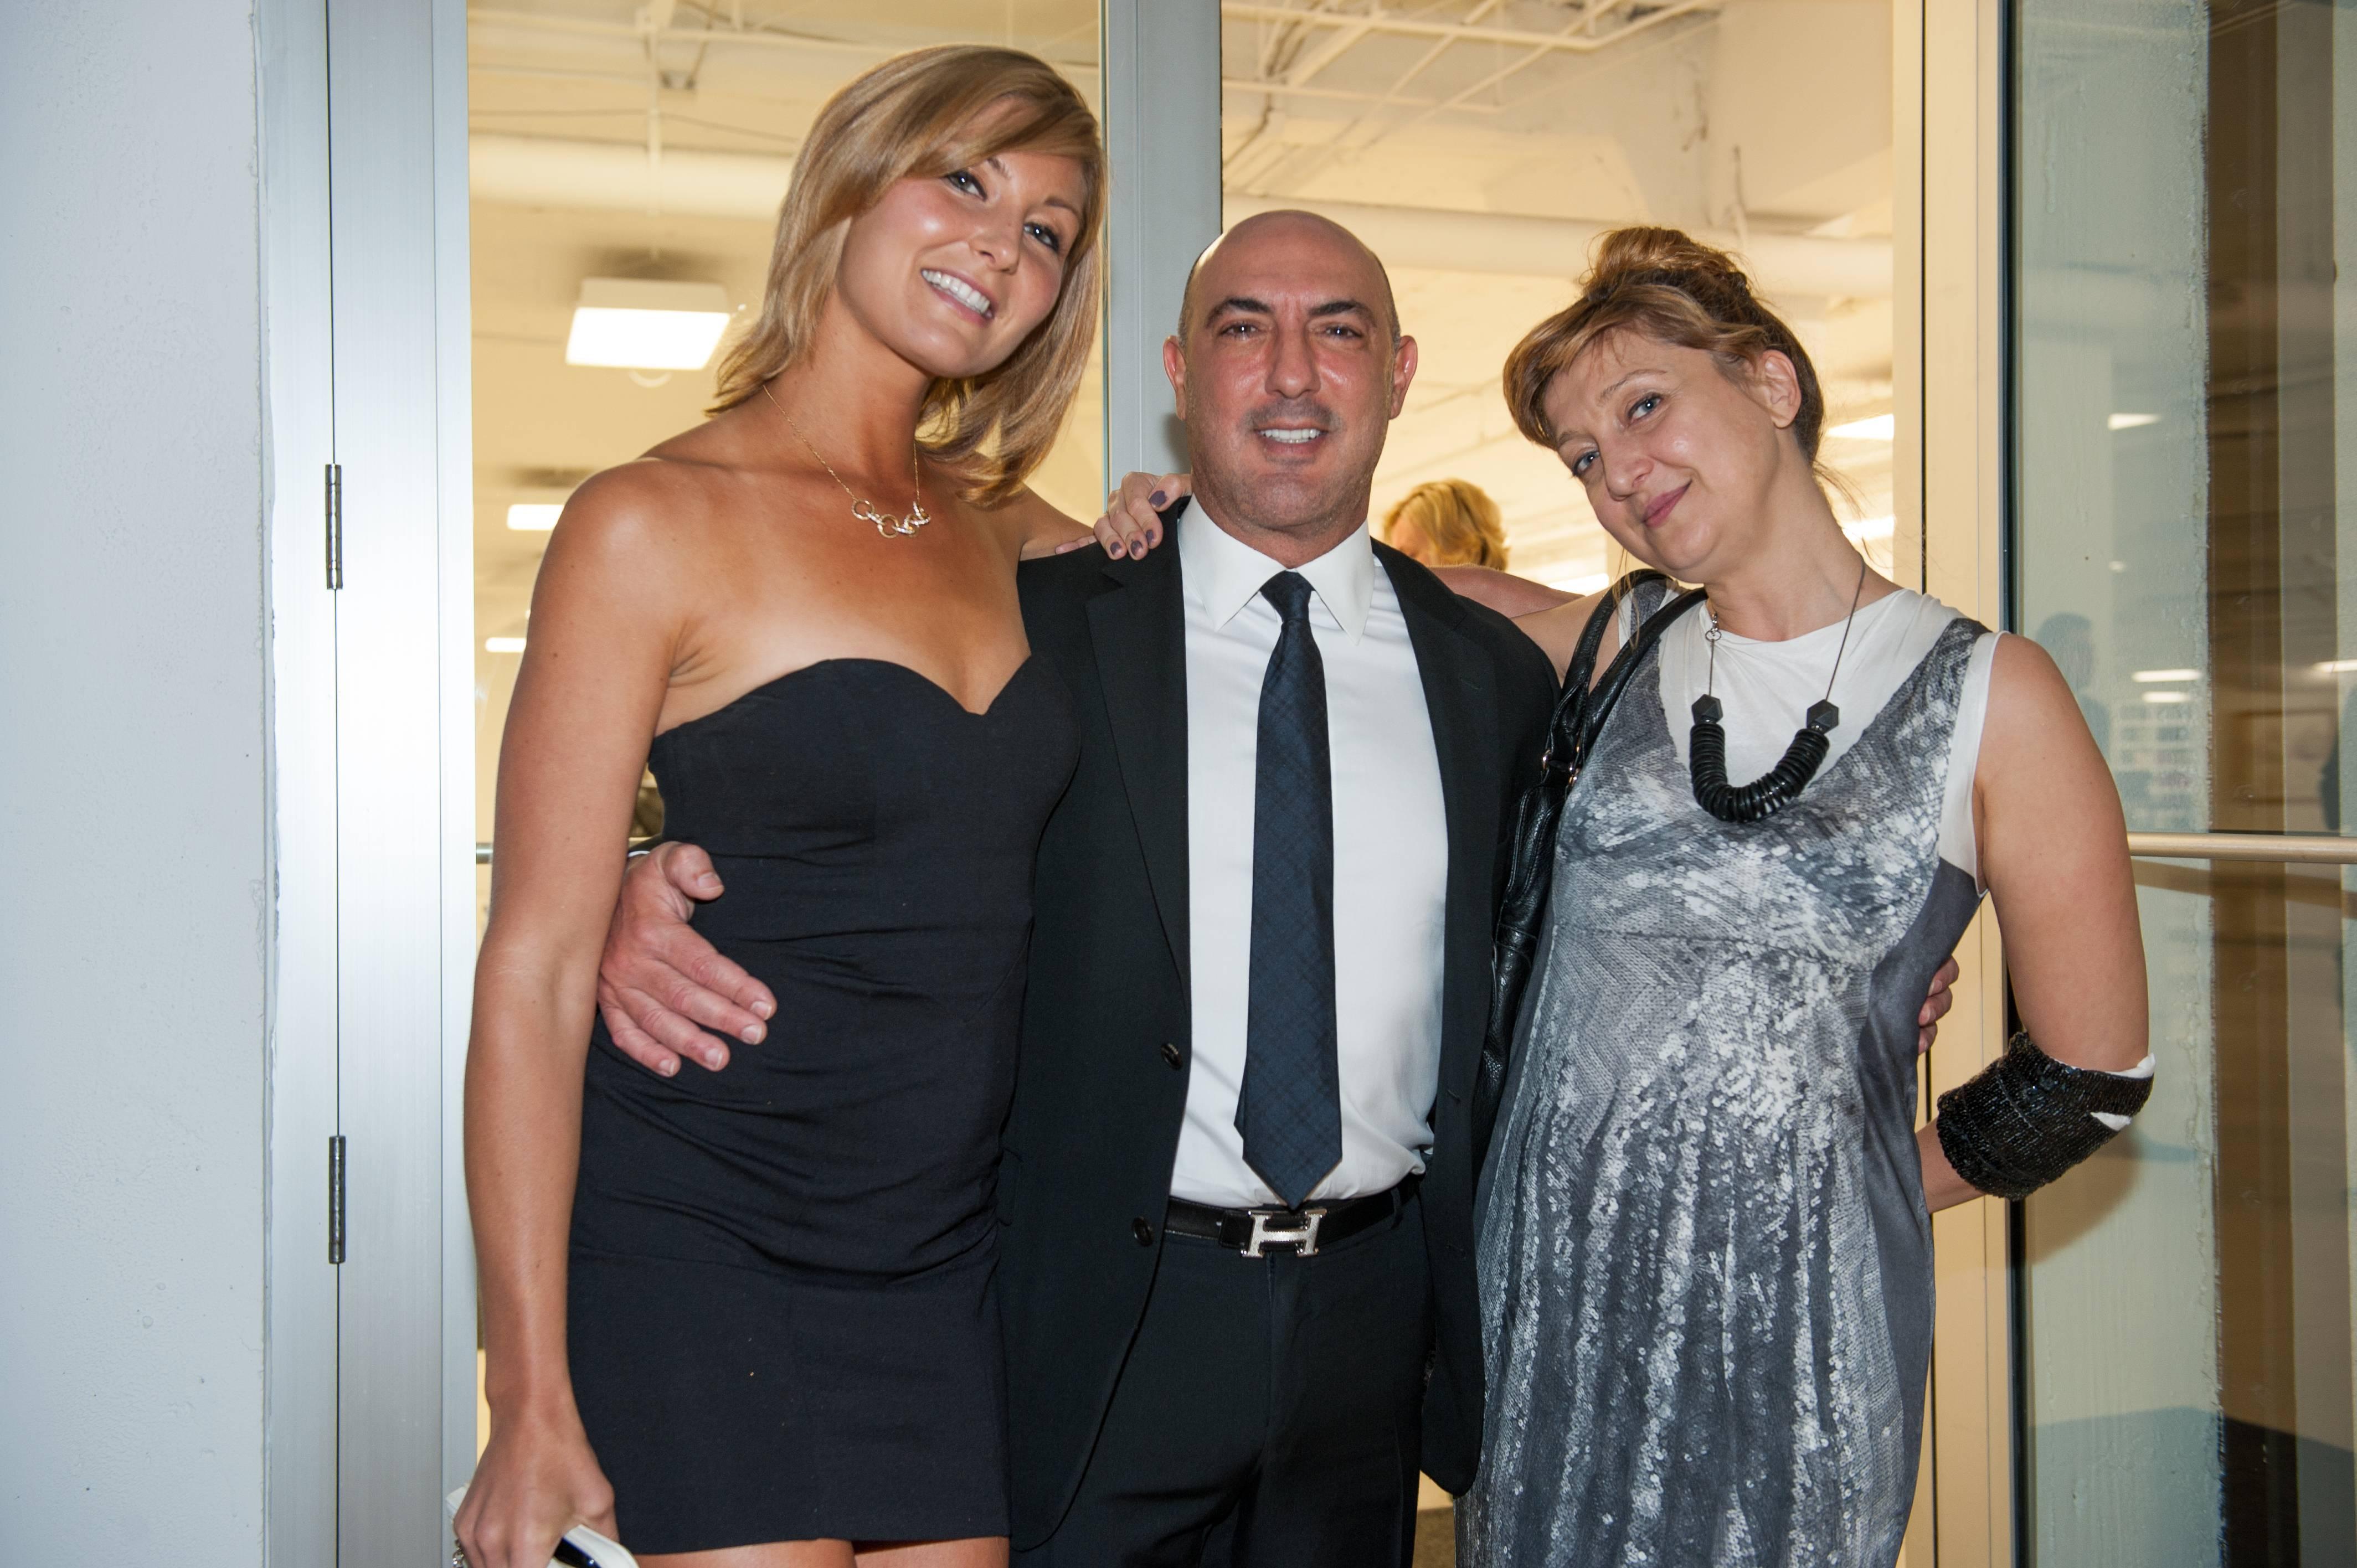 Gary Nader gallery showcasing art exhibit during Art Basel Miami week 2012. Photographer Serg Alexander IN305.com